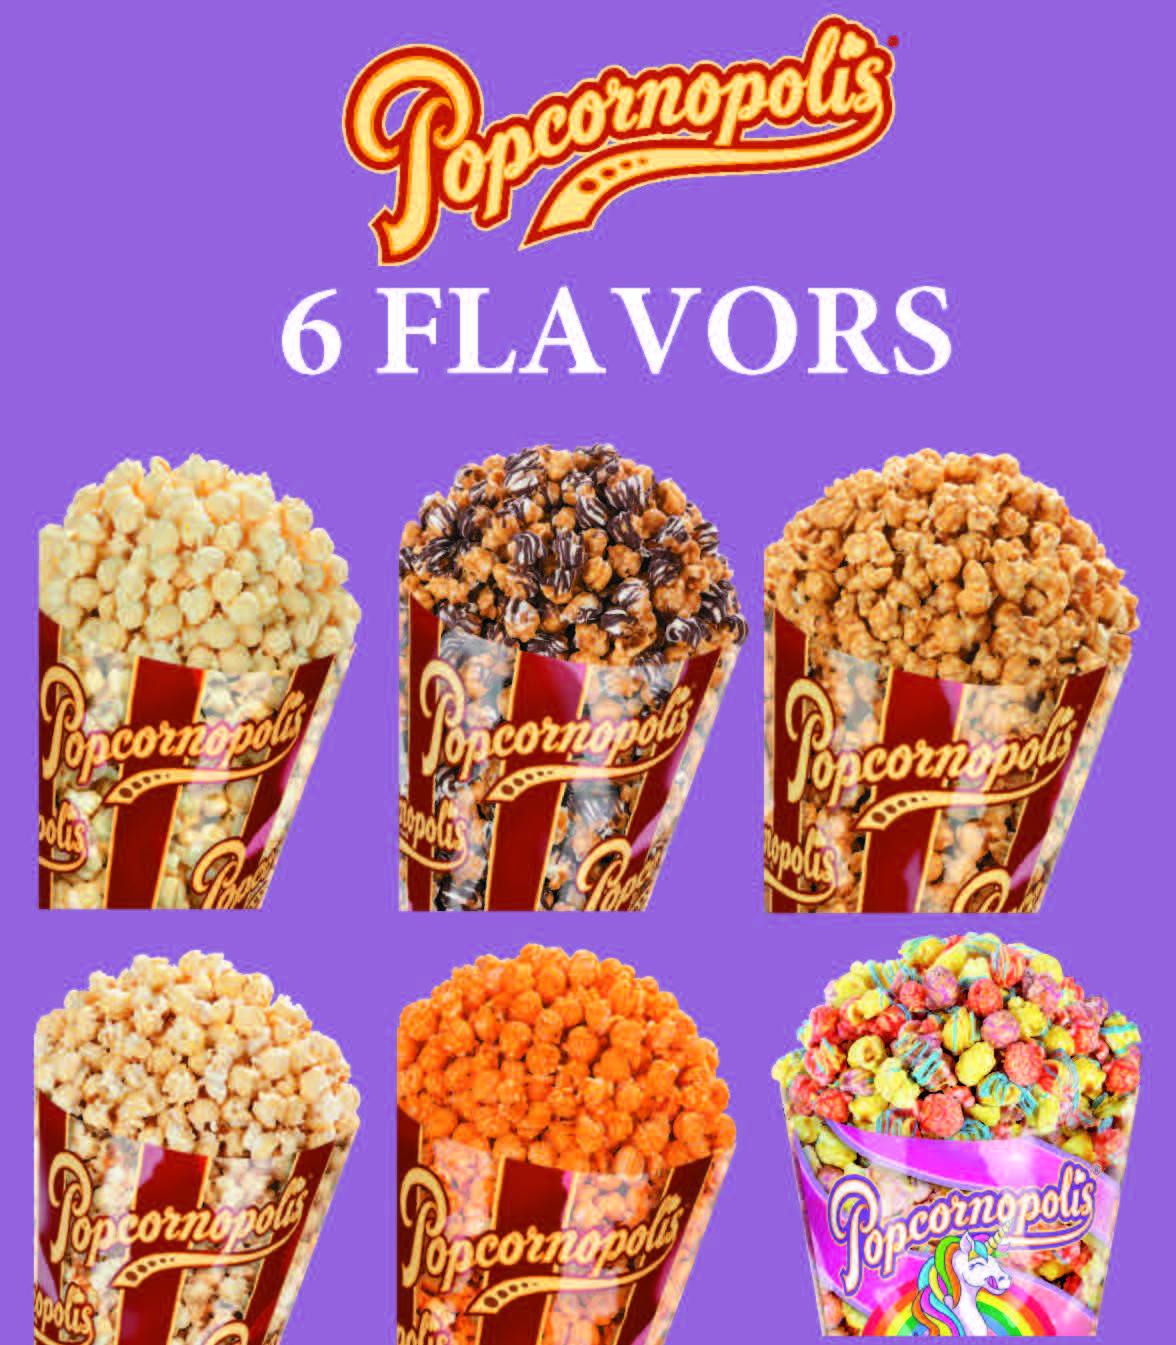 Popcornopolis 6 Flavors_Page_1